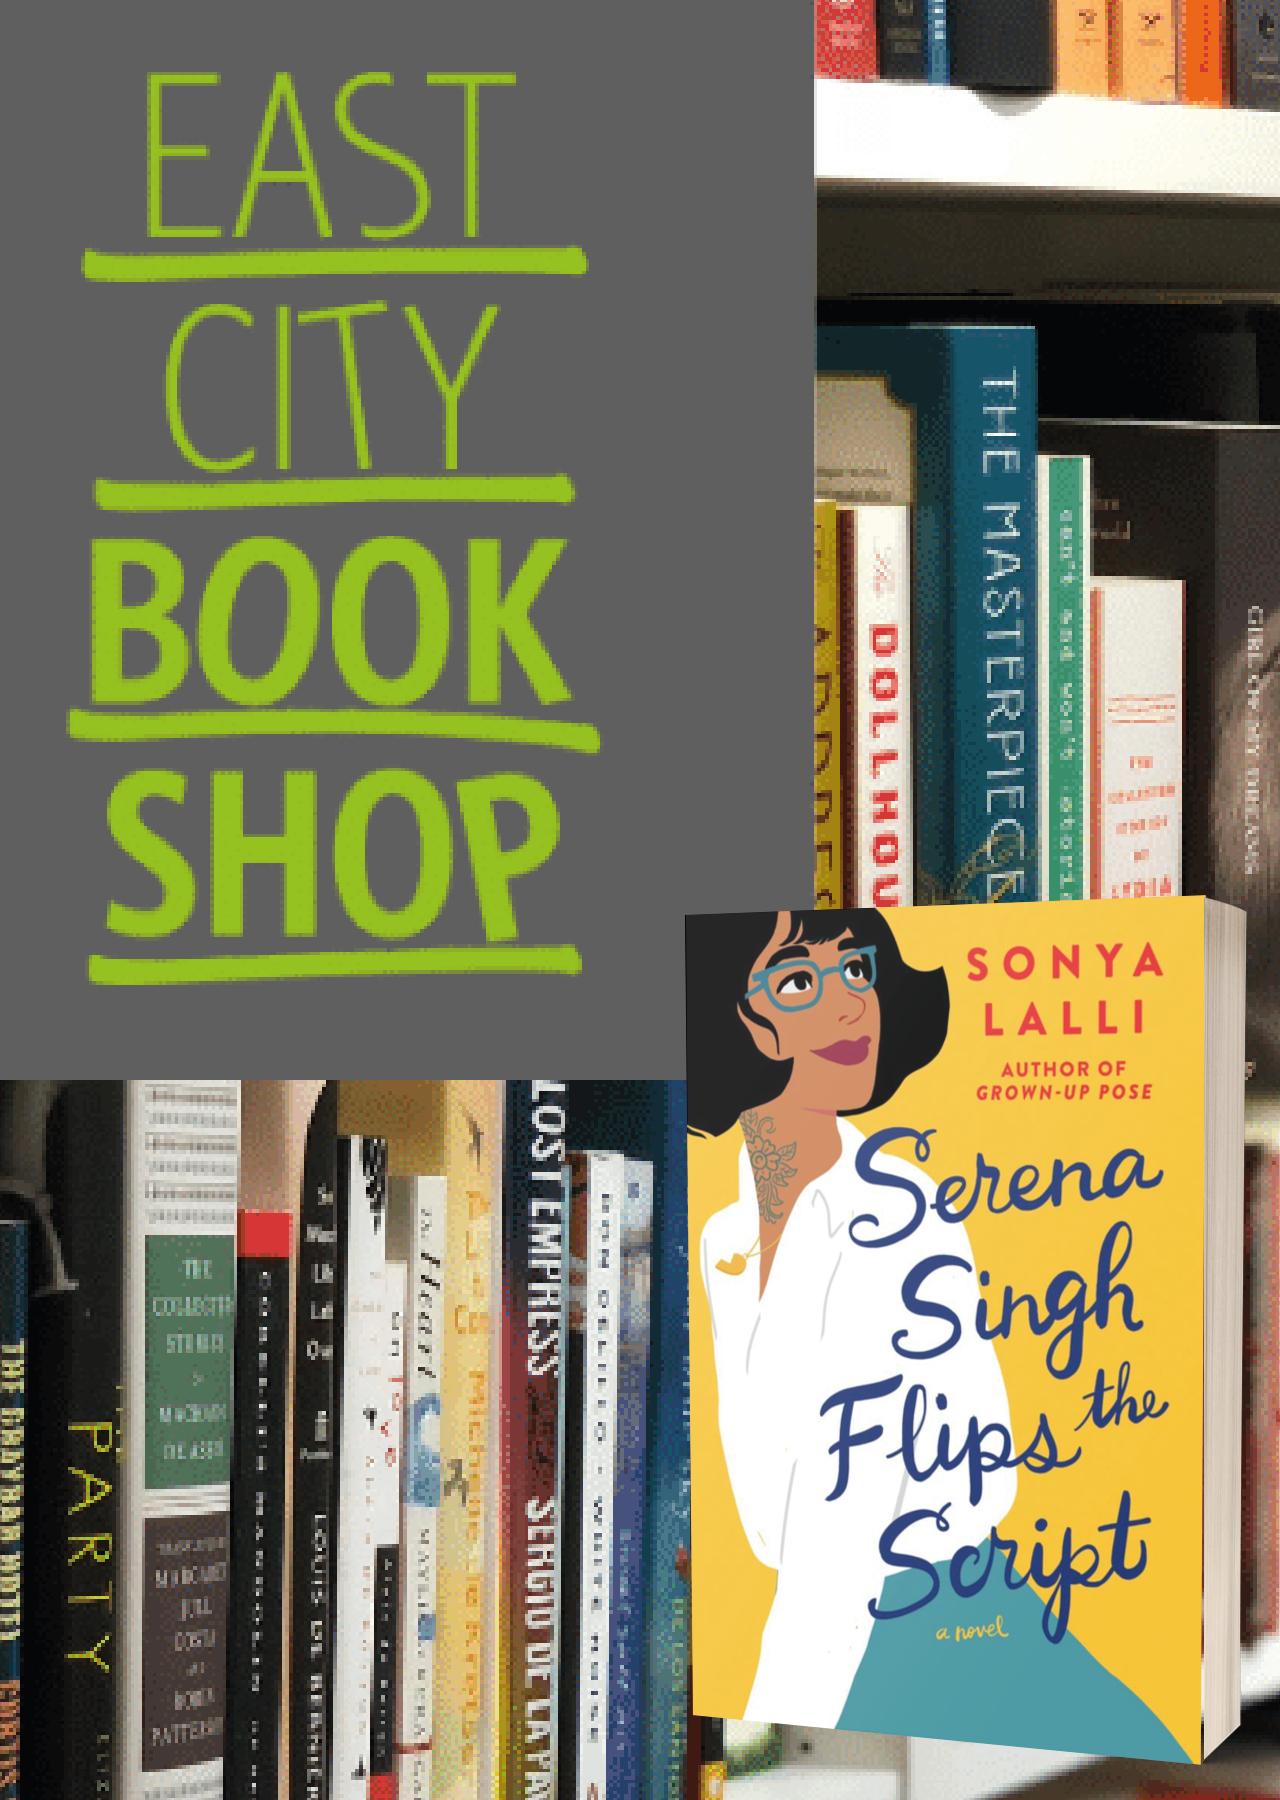 East City Book Shop event